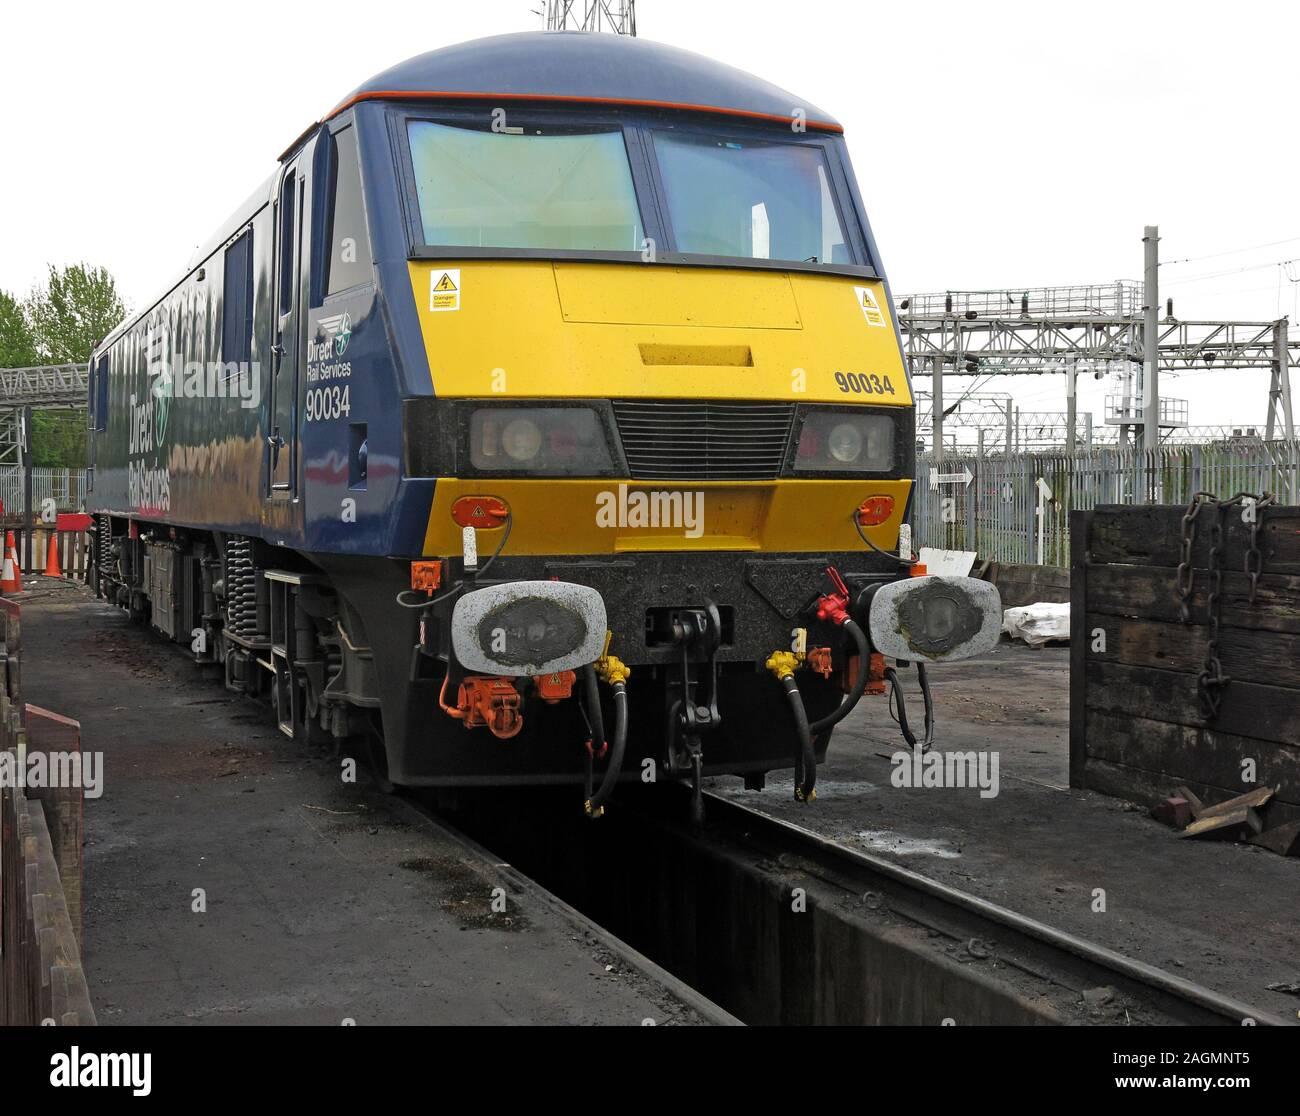 HotpixUK,@HotpixUK,GoTonySmith,Crewe works,rail,railway,trains,transport,history,BR,British Railways,UK,Great Britain,Crewe,Cheshire,England,loco,train,Locomotive,Services,North West England,90034,blue,yellow,freight,freight engine,rolling stock,fleet,track,lines,yard,Class90,DB Cargo UK,DB Schenker,Crewe Depots,The railway Age,repair pit,track pit